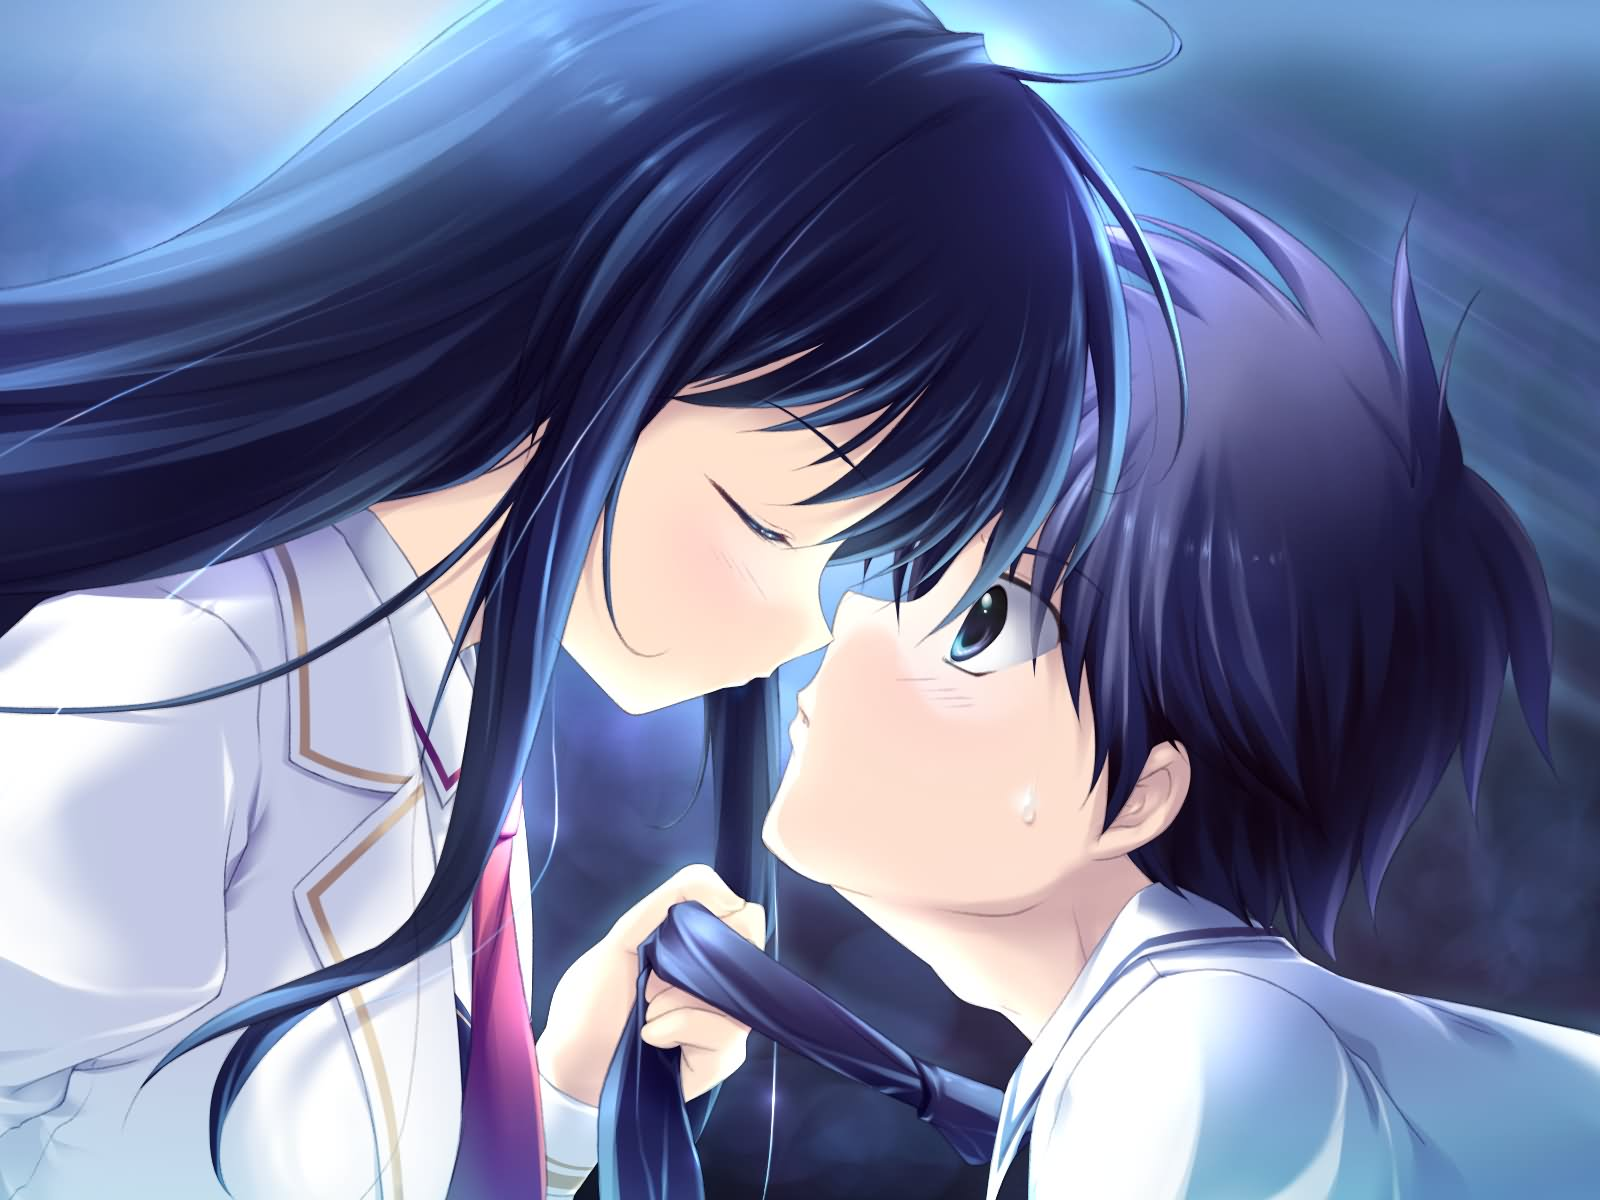 Cute Couples Wallpaper Free Download Download Free Cute Anime Couple Backgrounds Pixelstalk Net